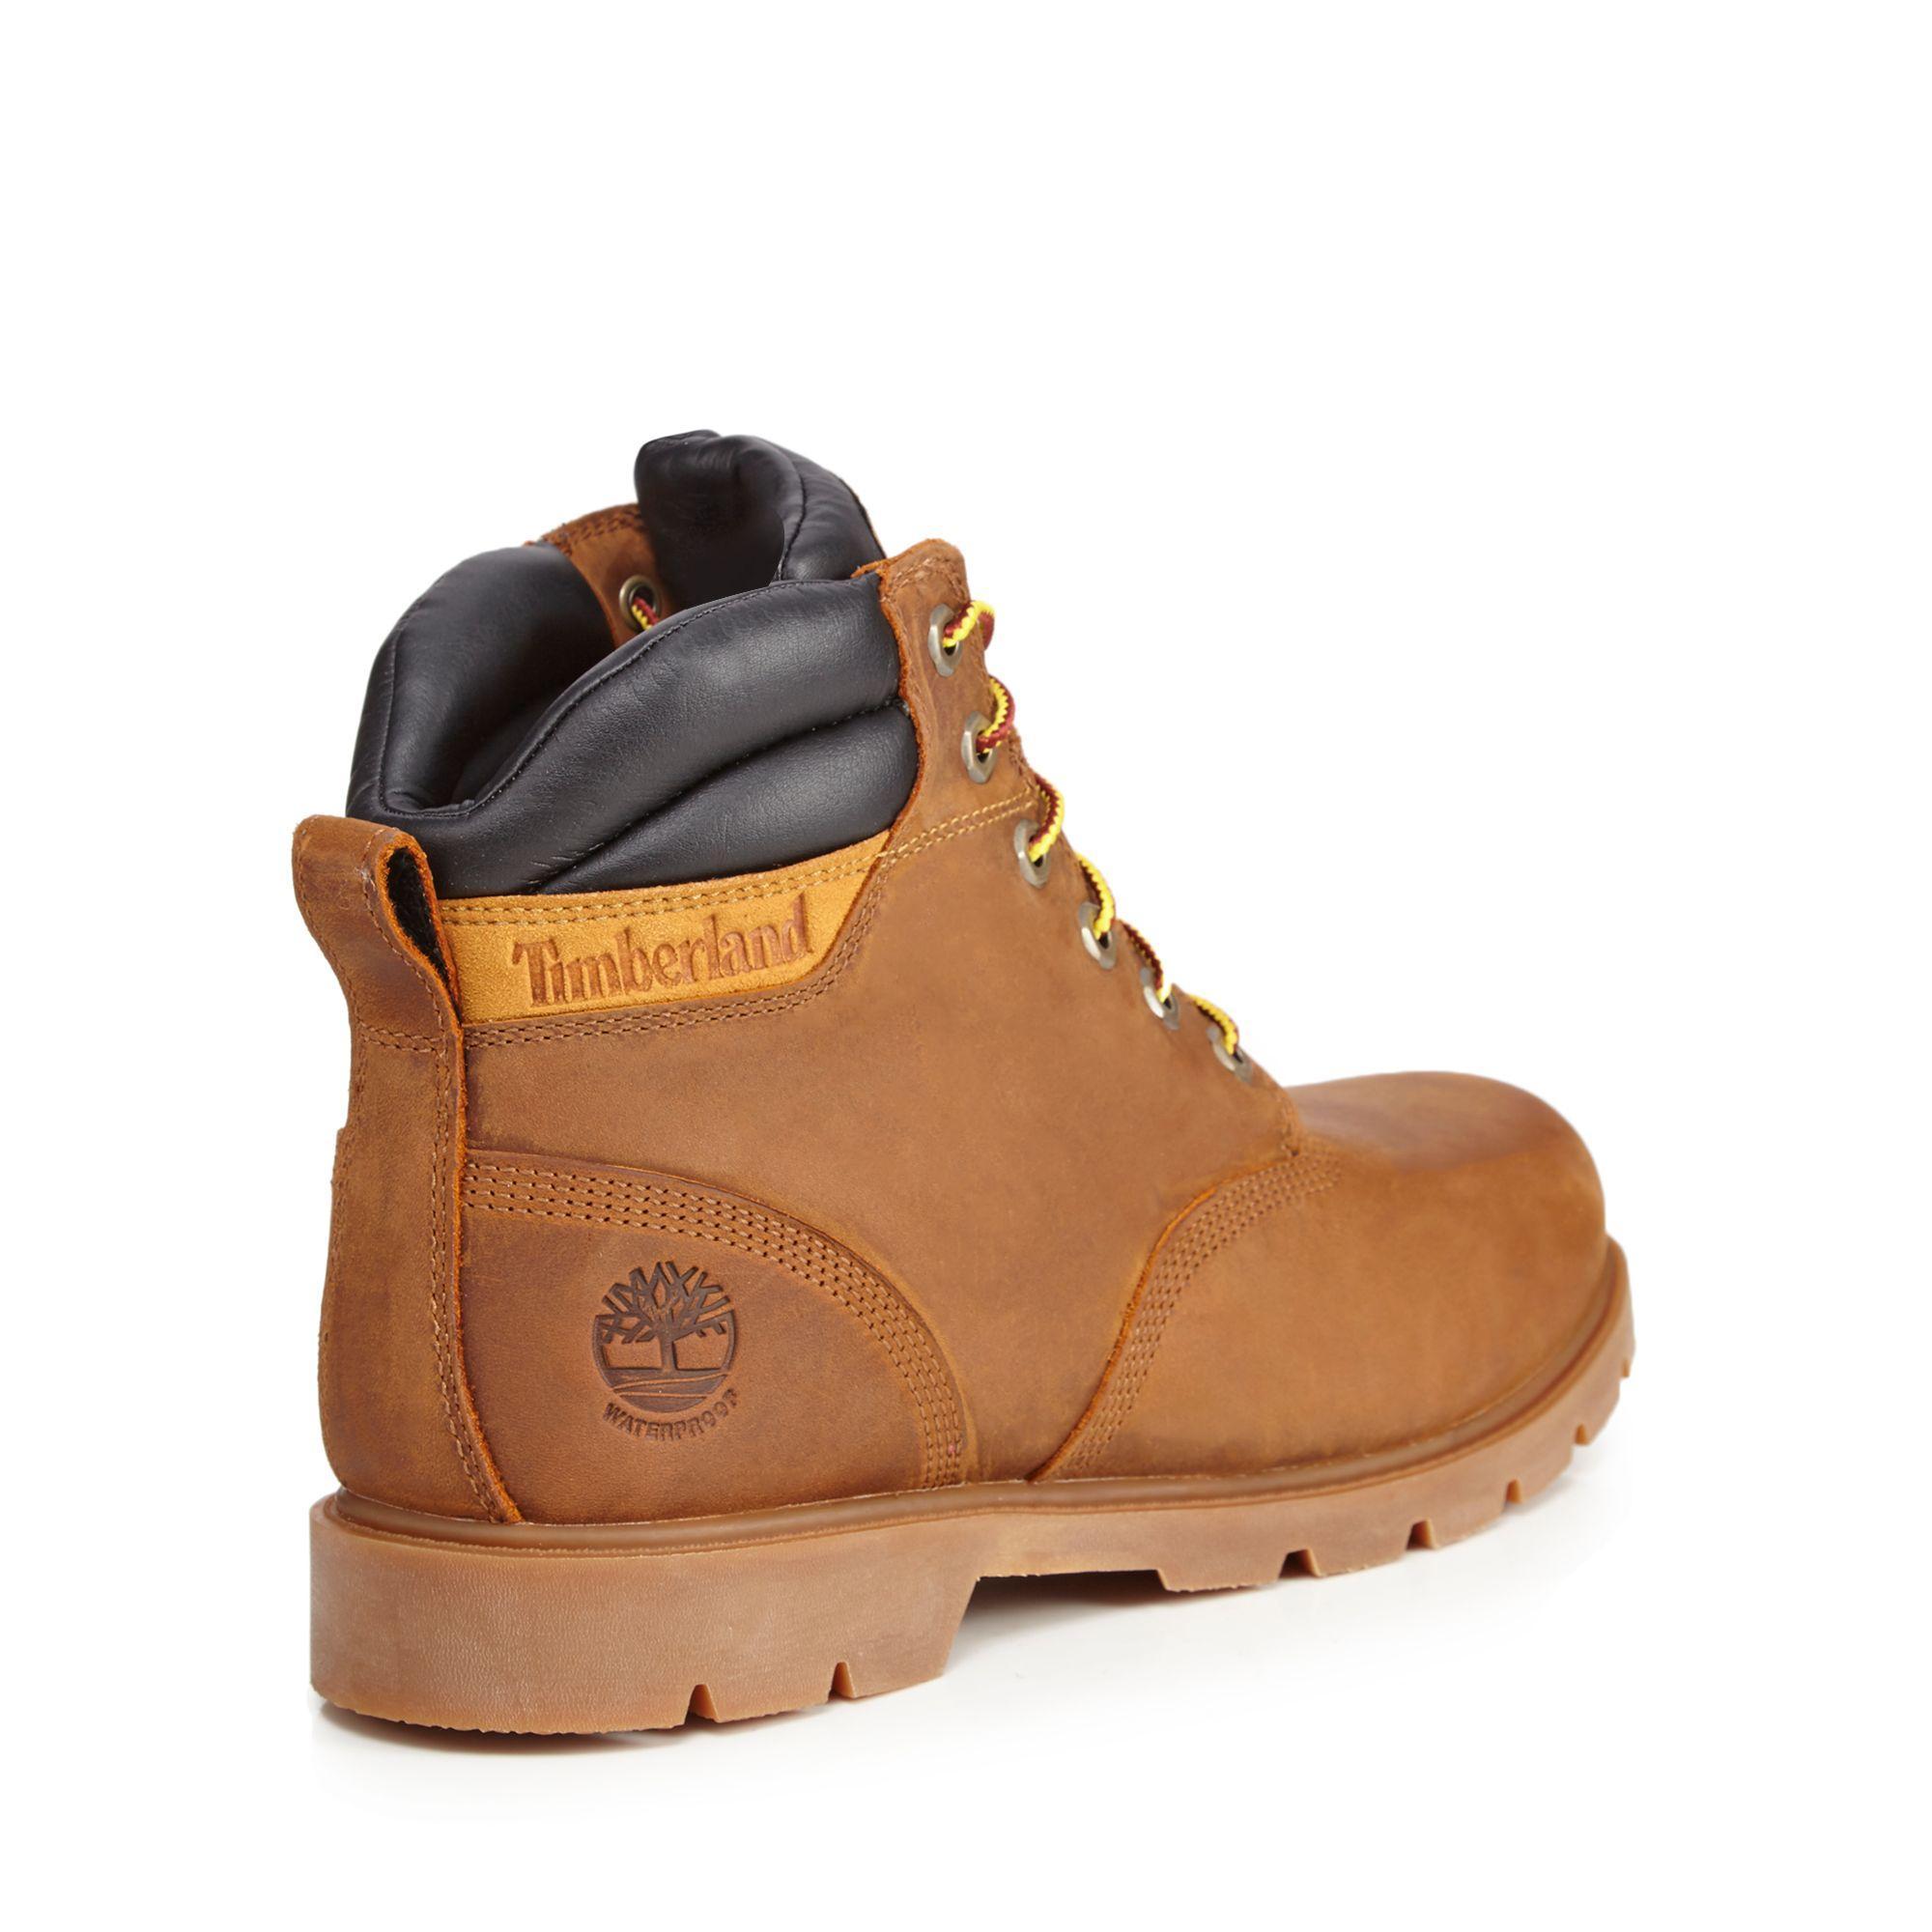 timberland boots debenhams